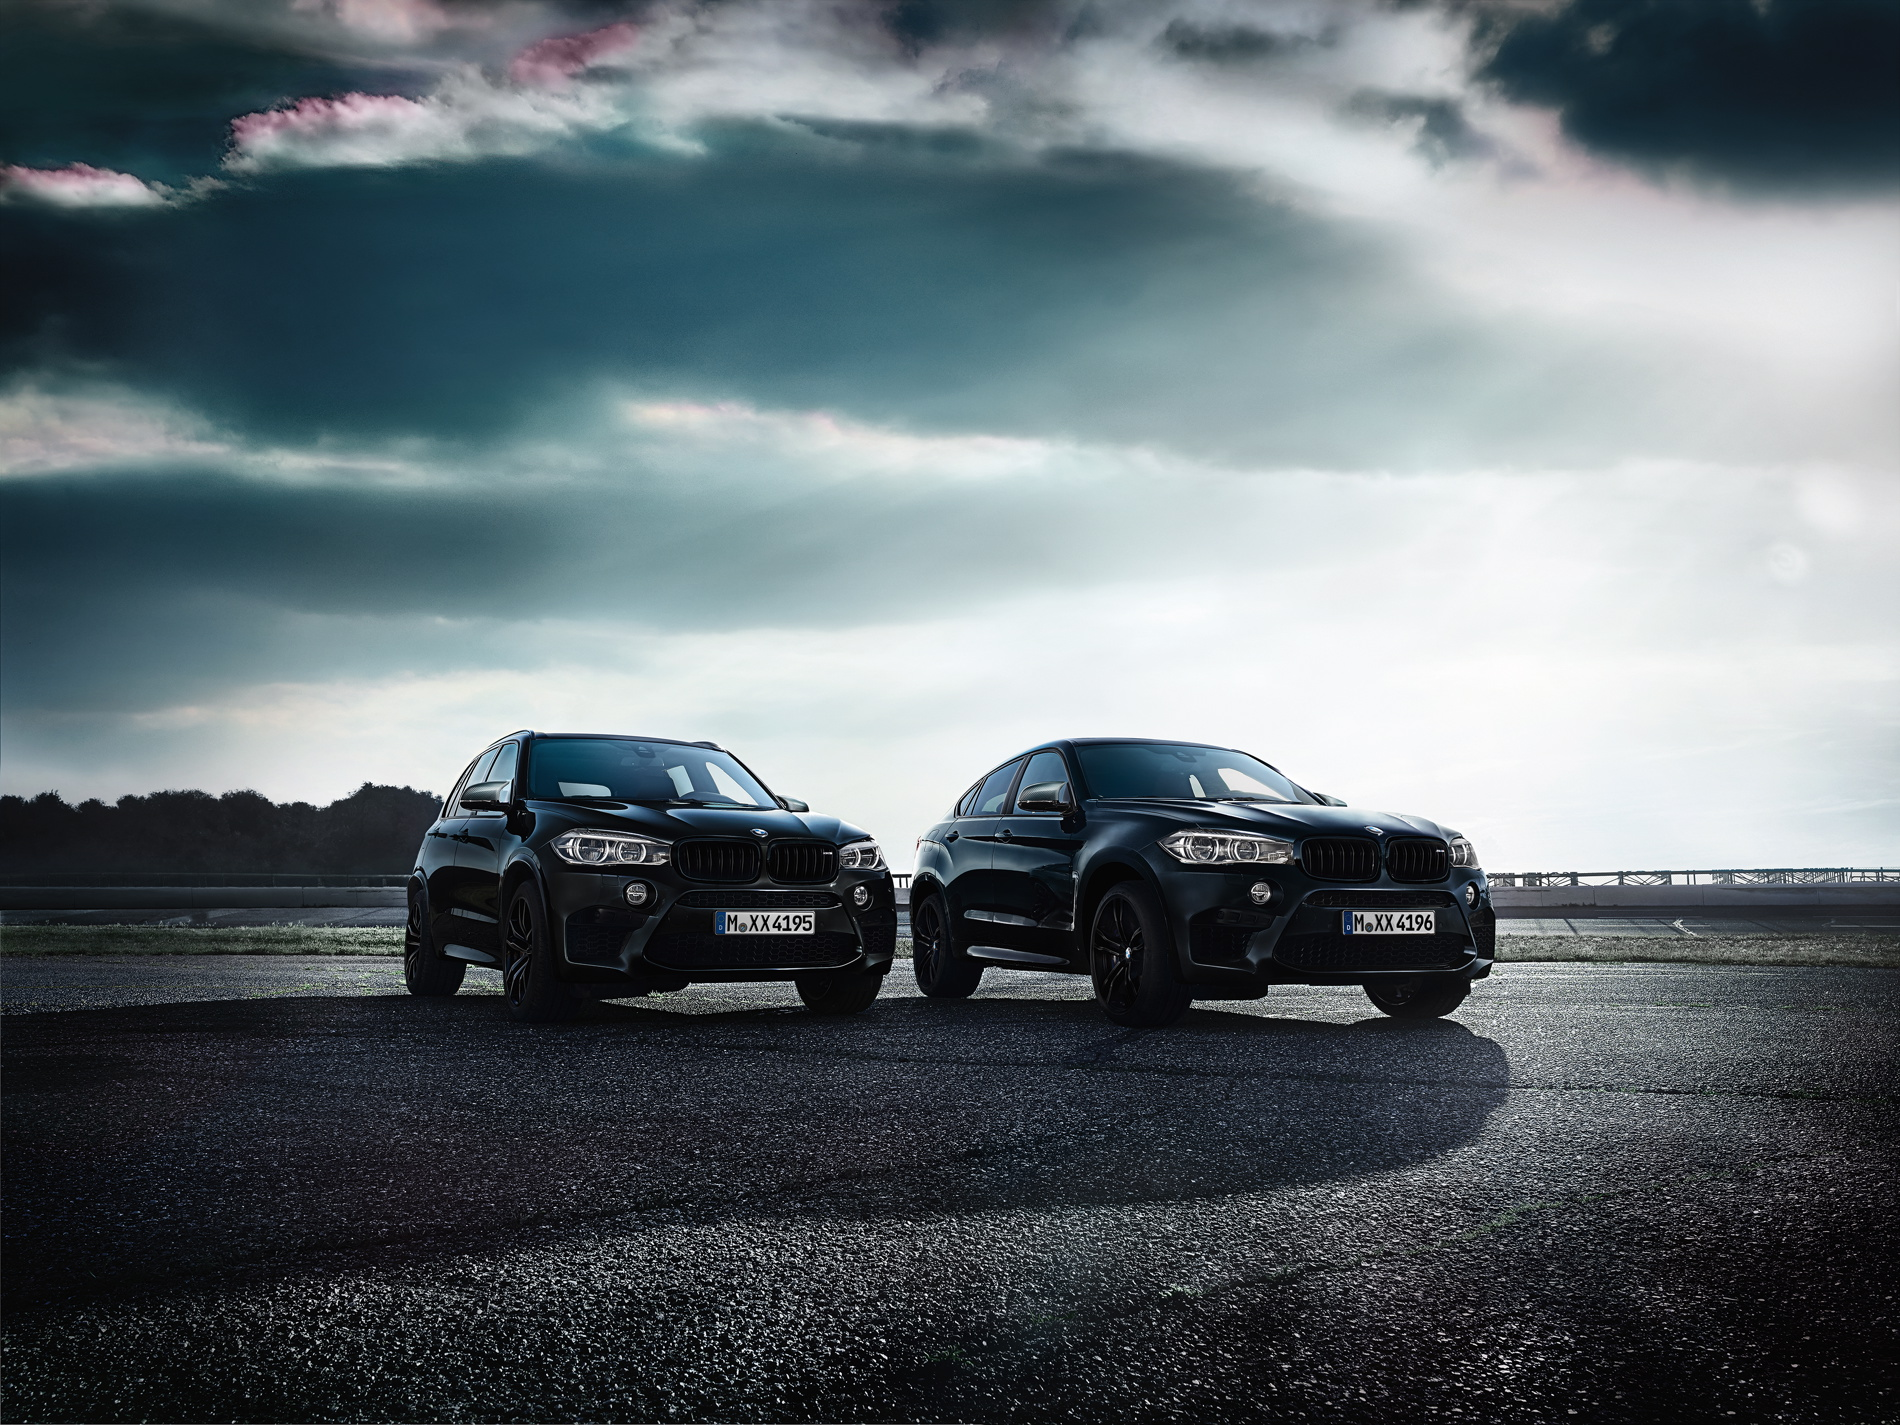 BMW X5M Black Fire Edition 13